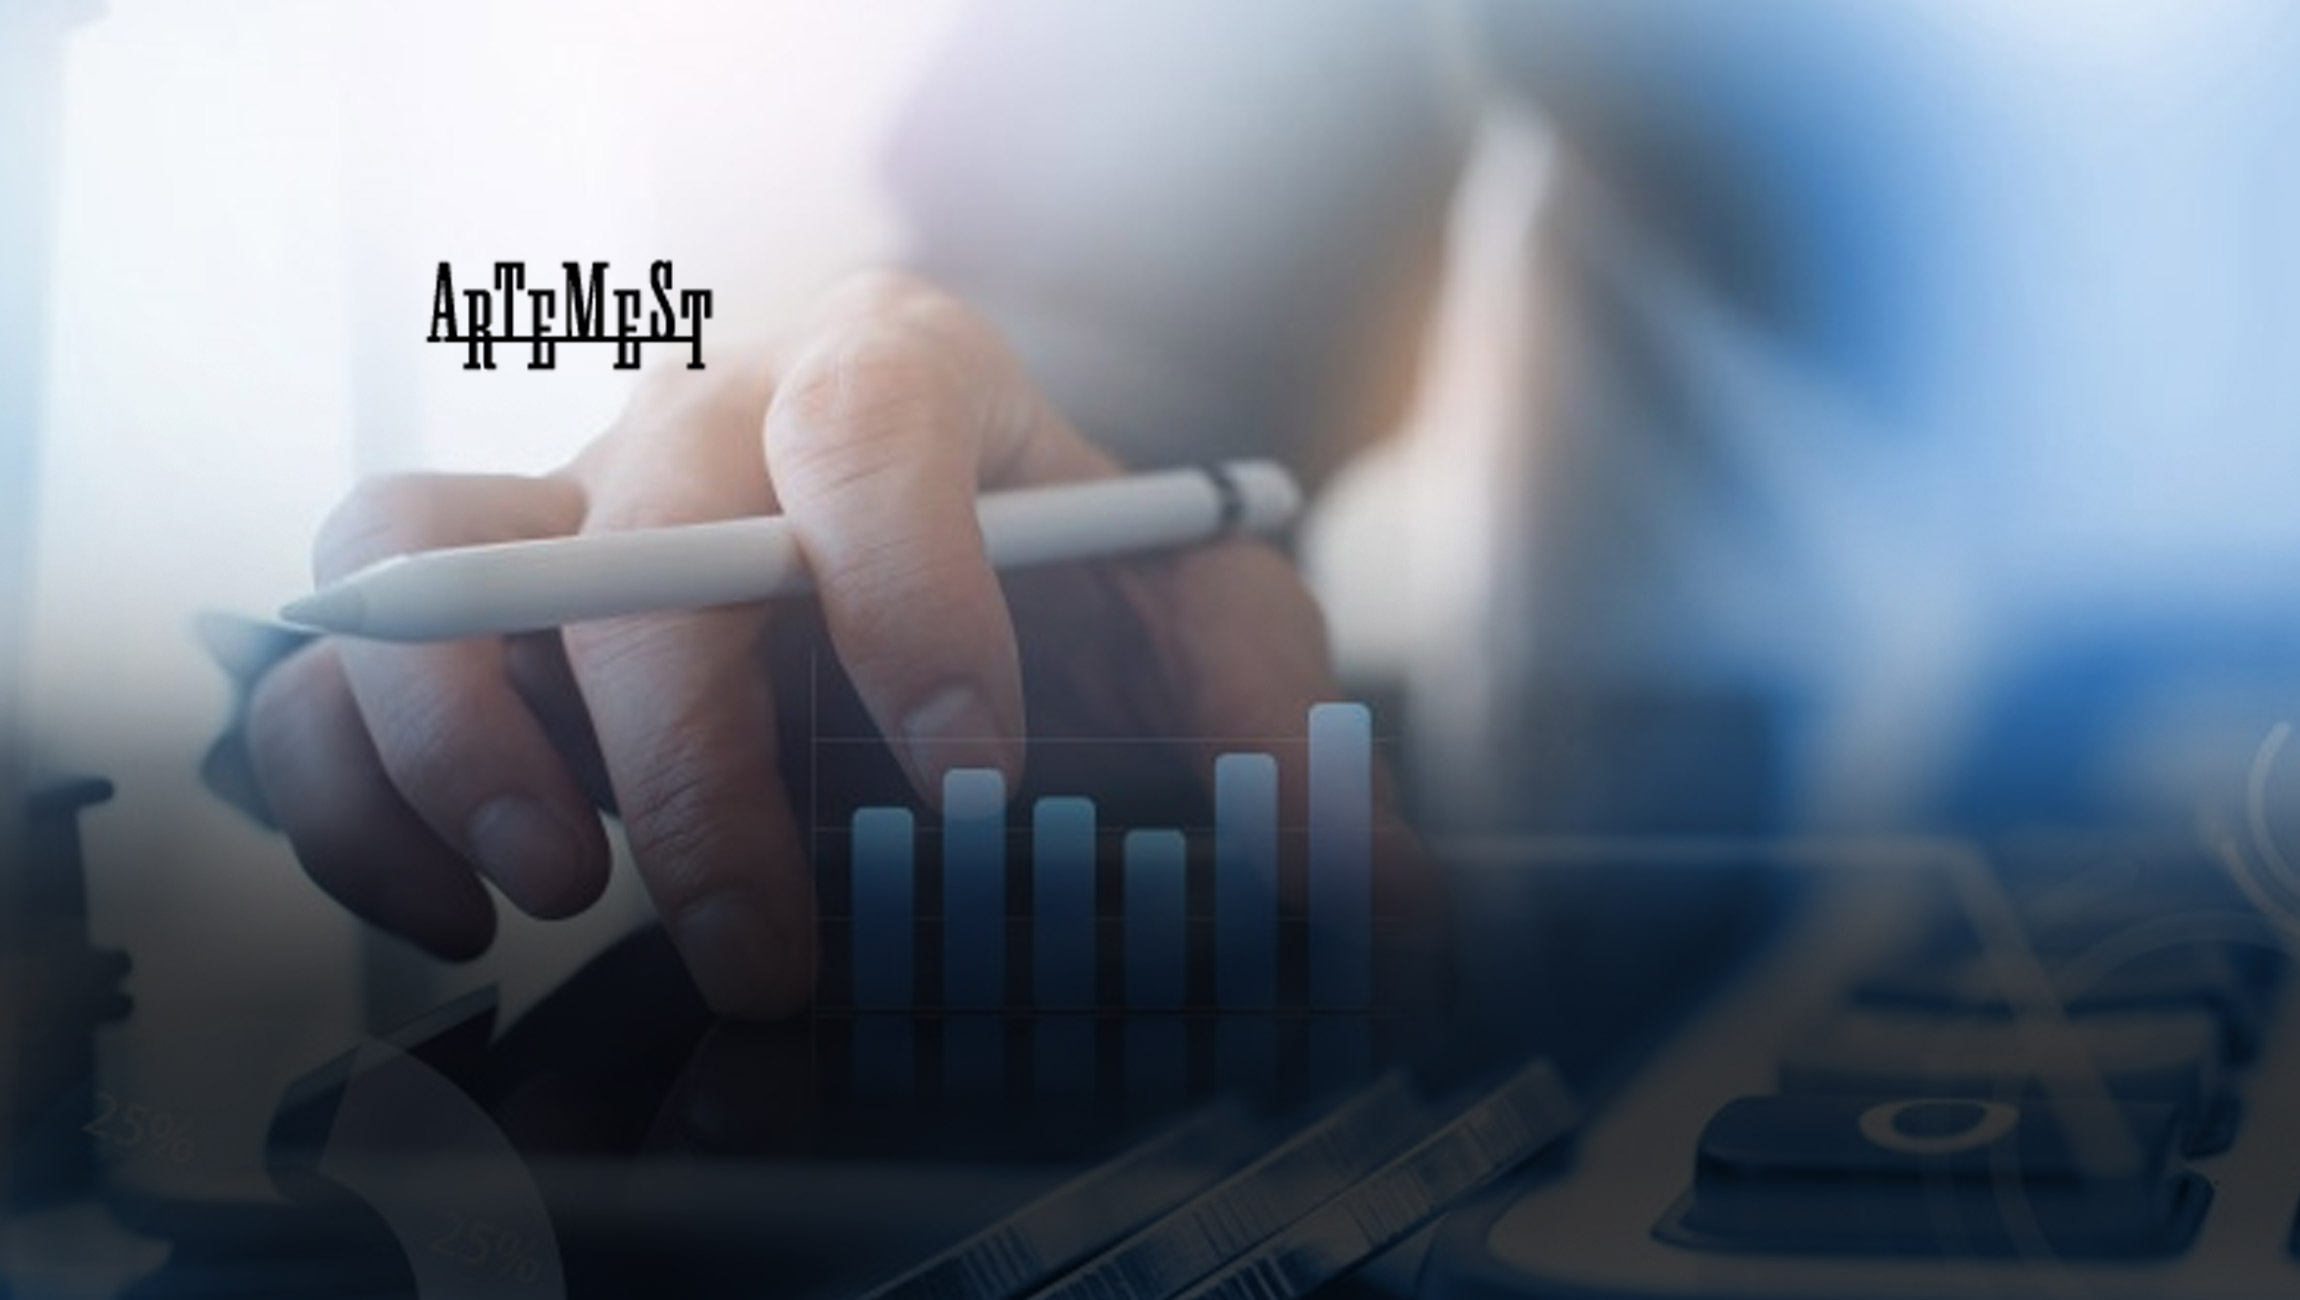 Luxury Marketplace Artemest Raises $5M+ in Equity Funding Round